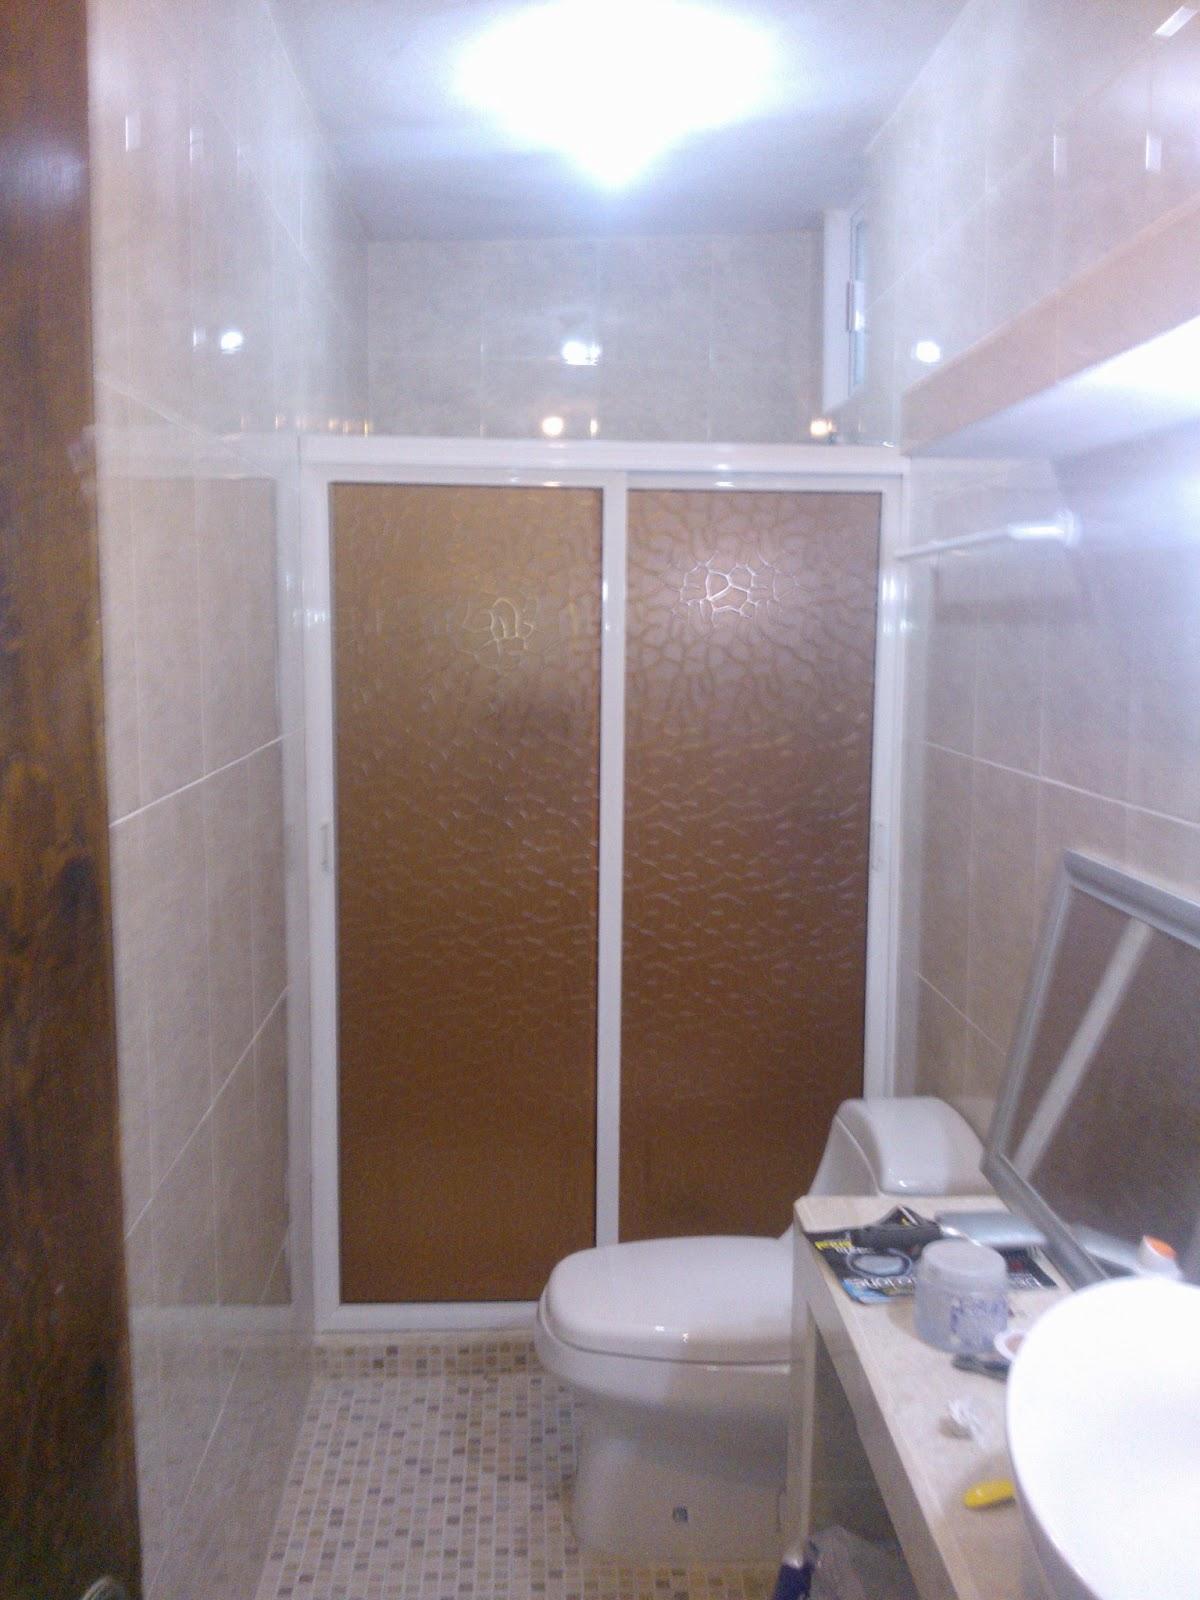 Puertas De Baño Aluminio:Puertas, ventanas de aluminio: Canceleria para baño con plastico